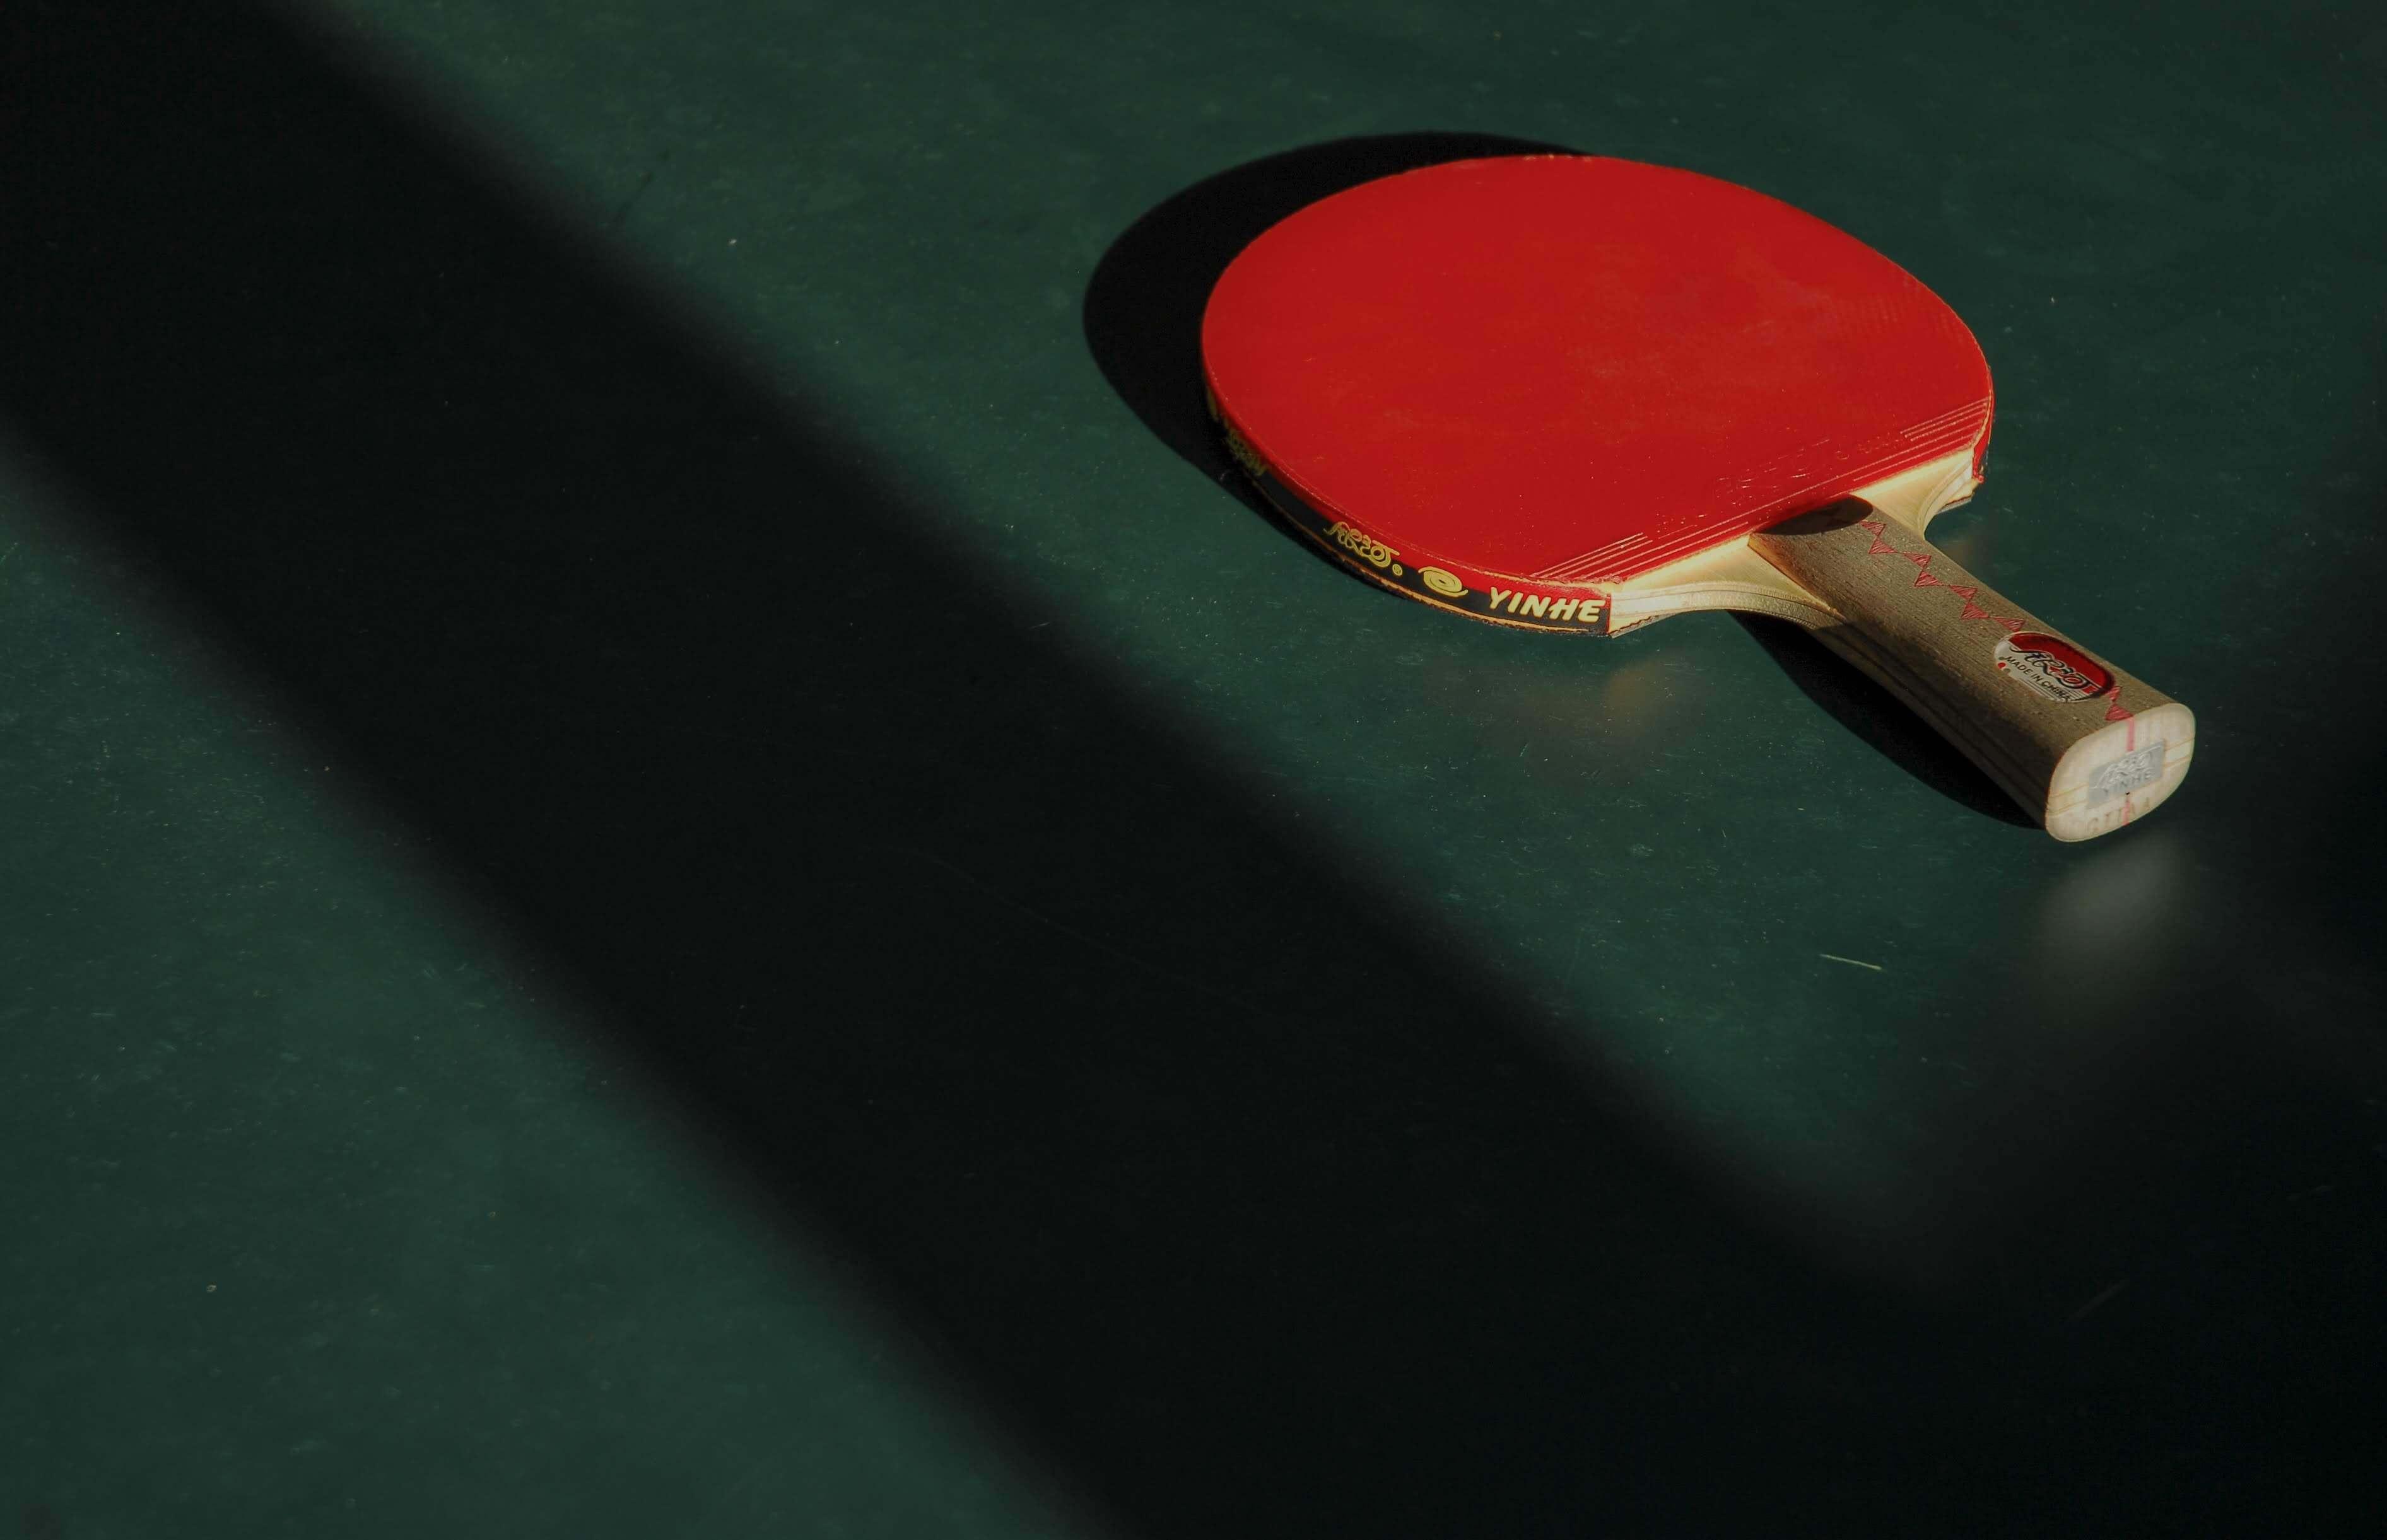 Remarkable Milwaukee Table Tennis Club Interior Design Ideas Helimdqseriescom